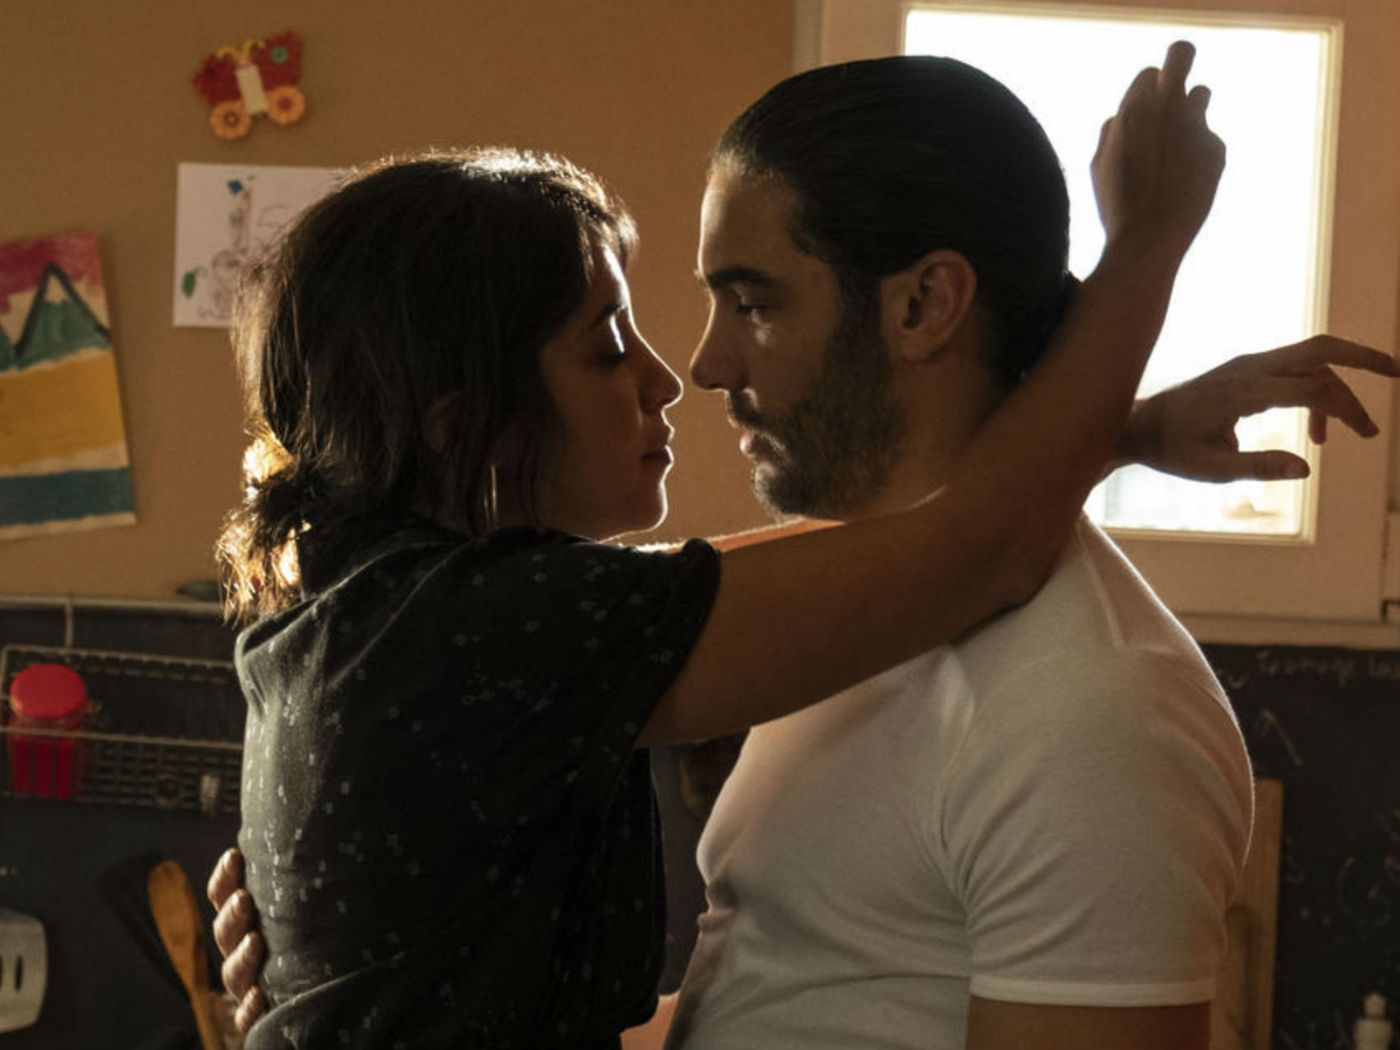 Netflix announce new musical drama series 'The Eddy' from 'La La Land' director